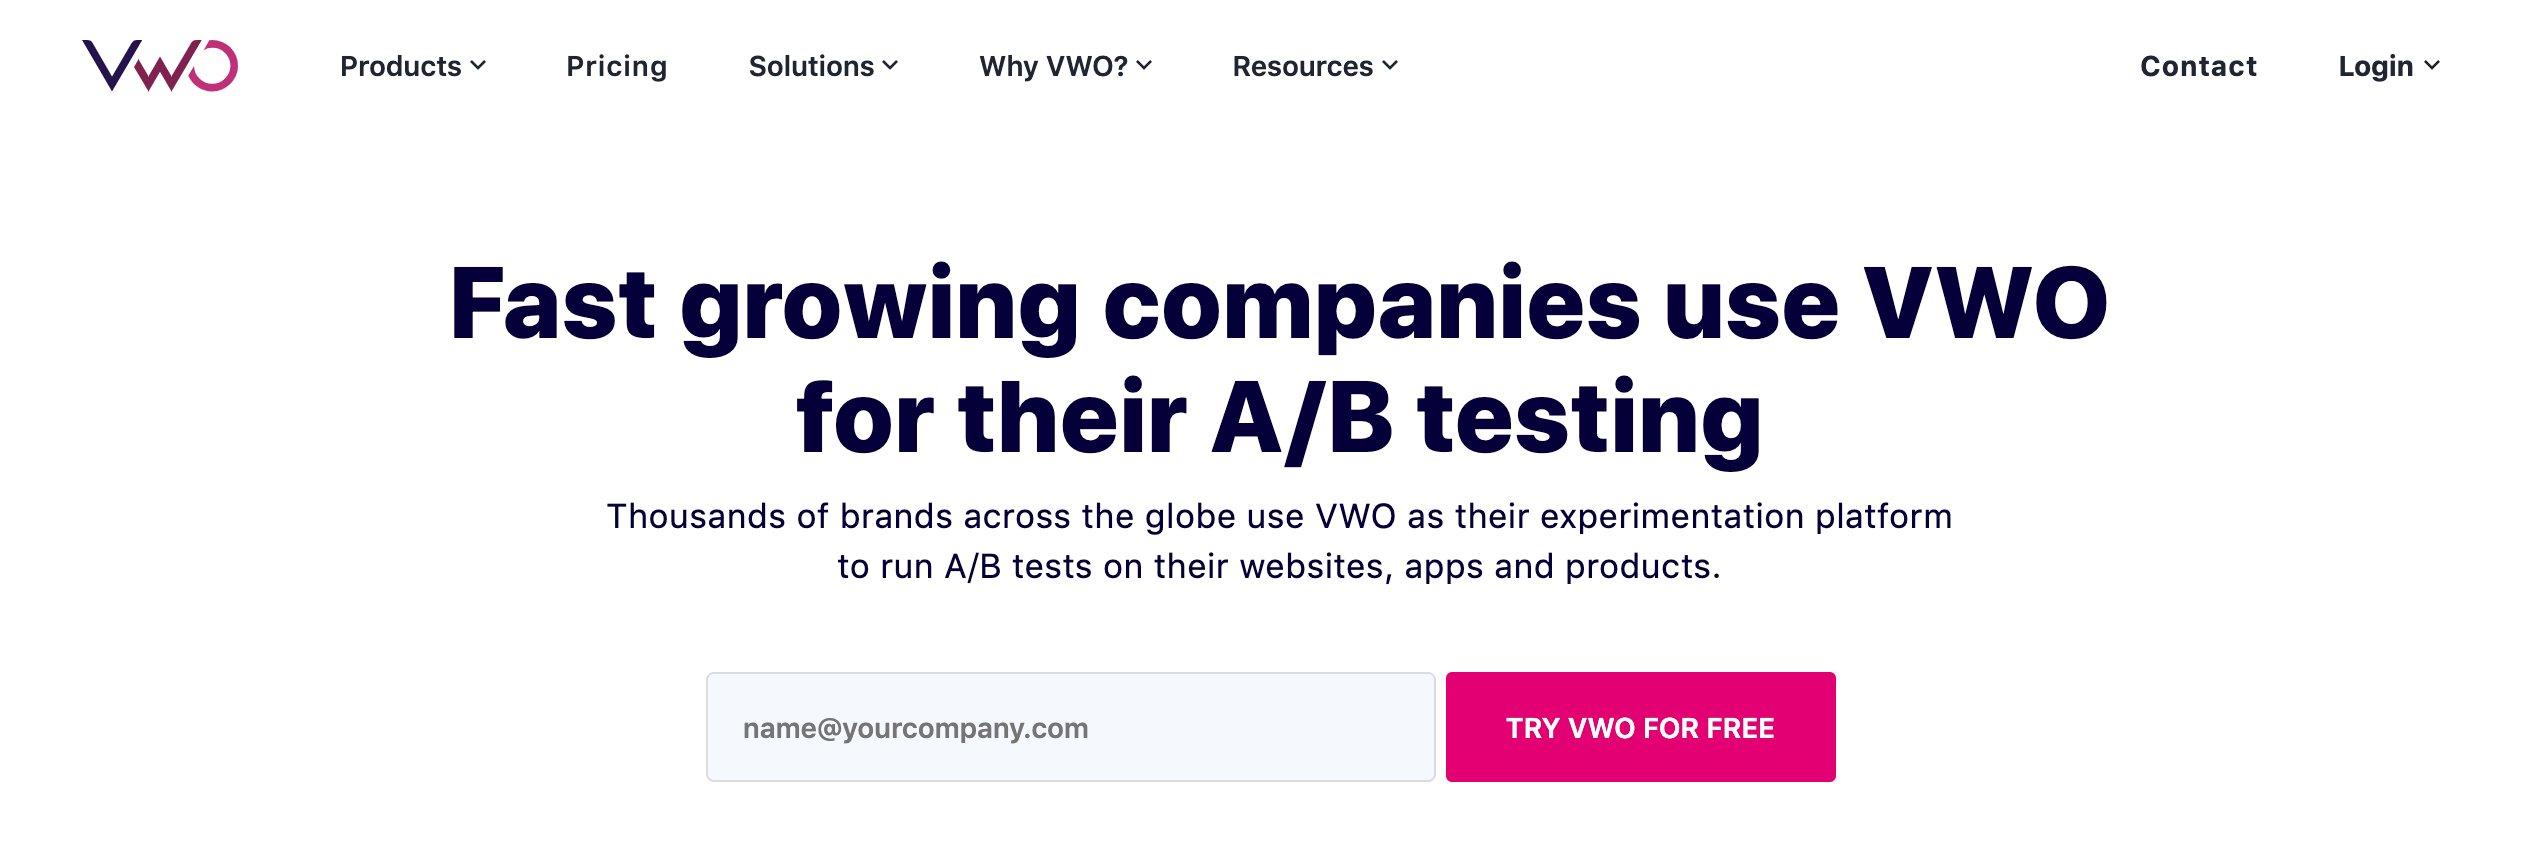 Vwo Homepage Cta